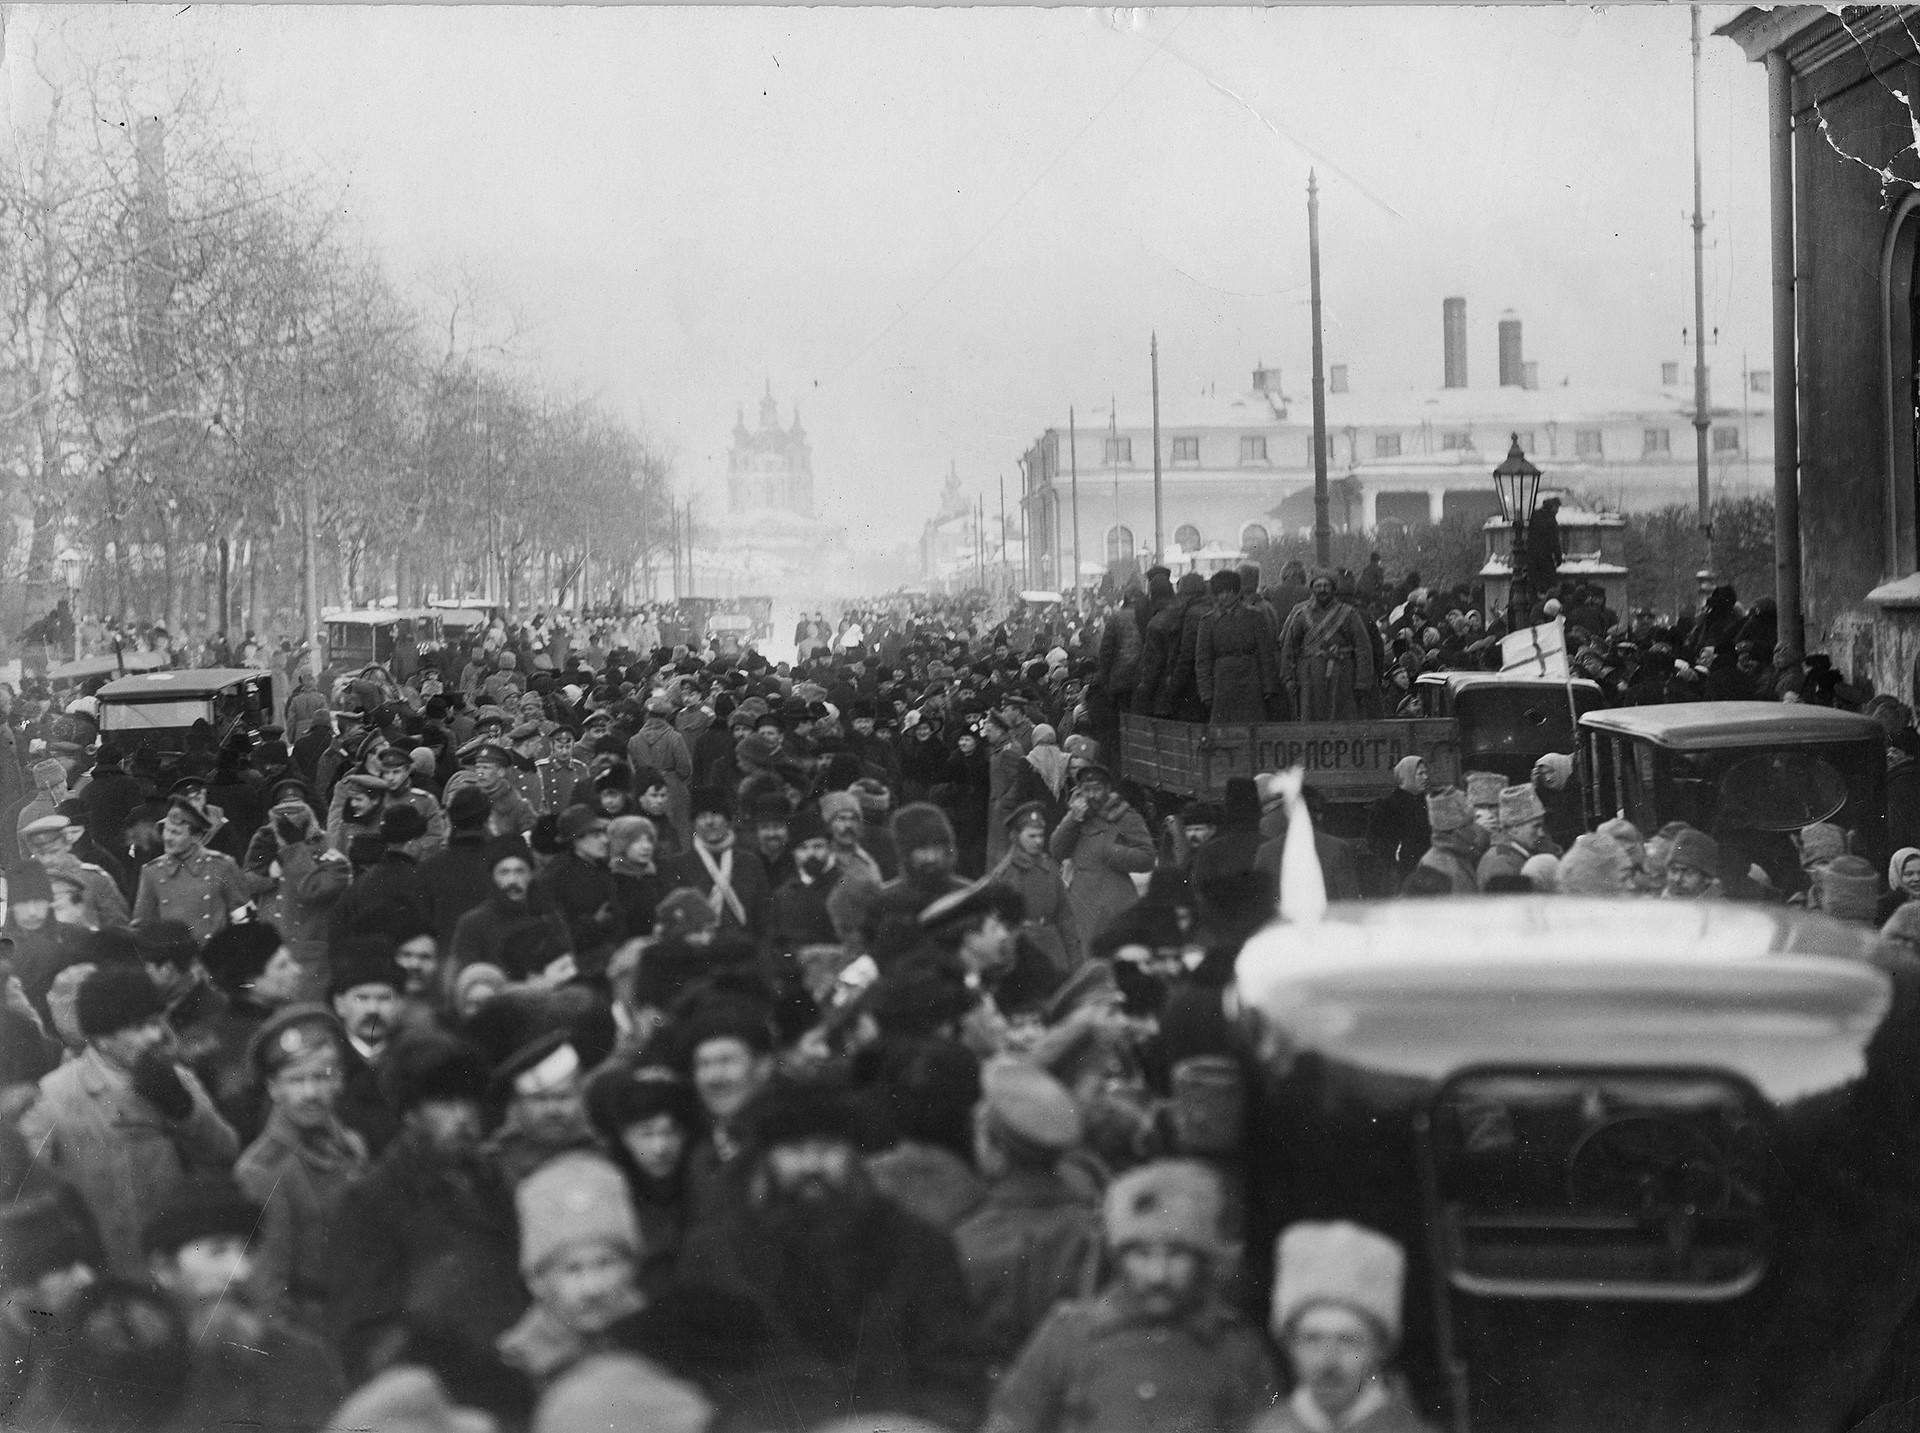 Revolutionary Petrograd (former name of St. Petersburg) in 1918.